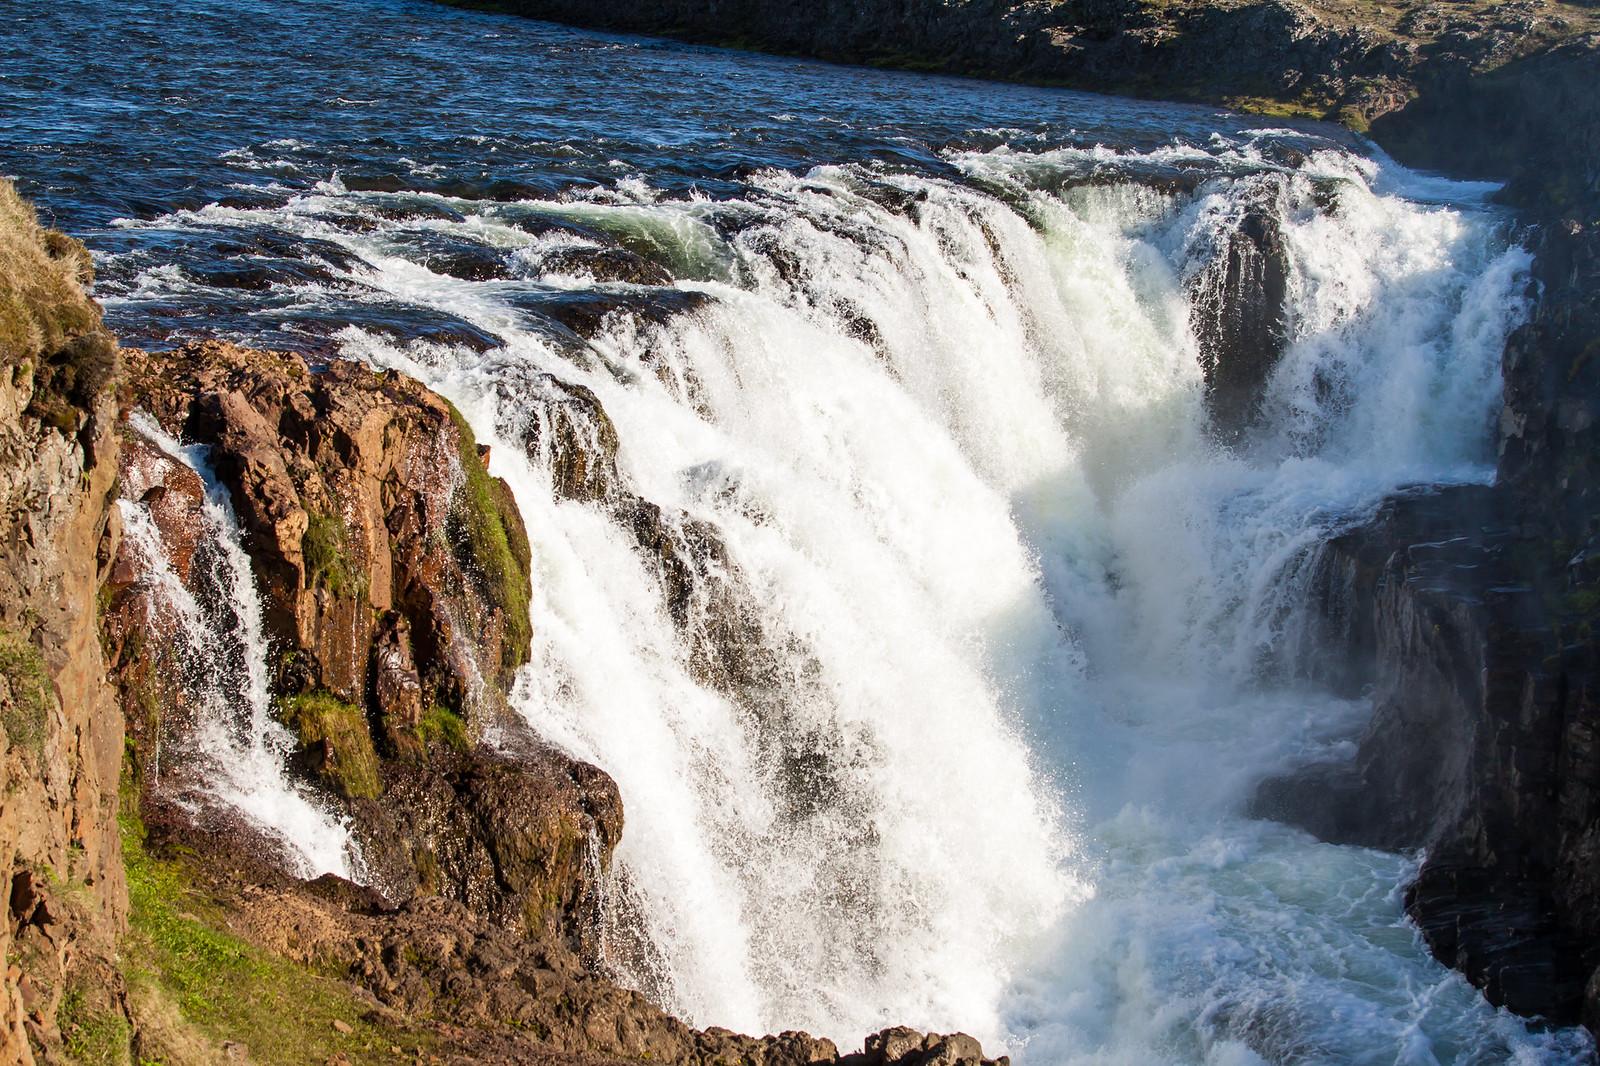 Iceland waterfall Kolugljufur